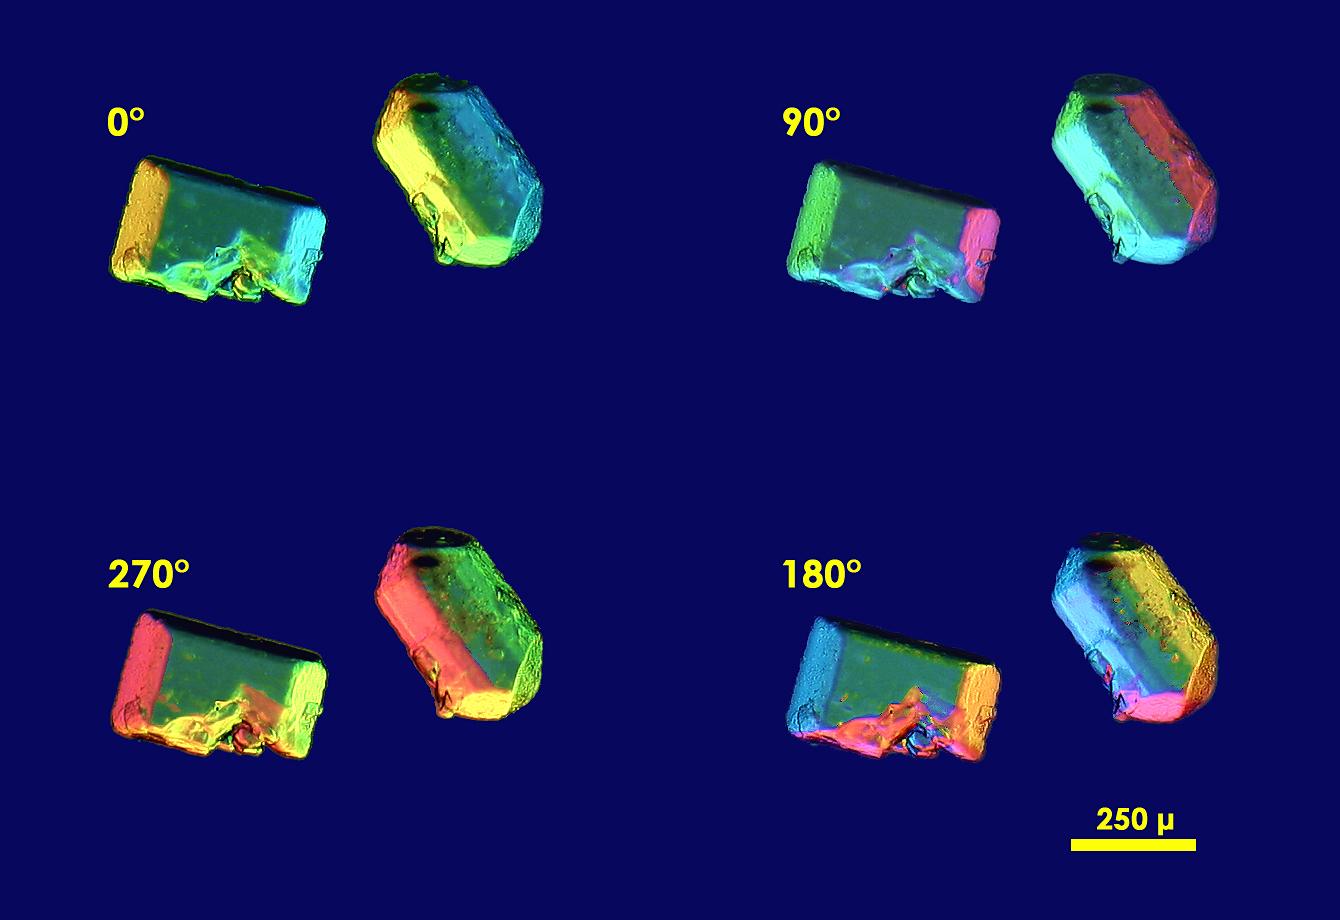 Sucrose crystals